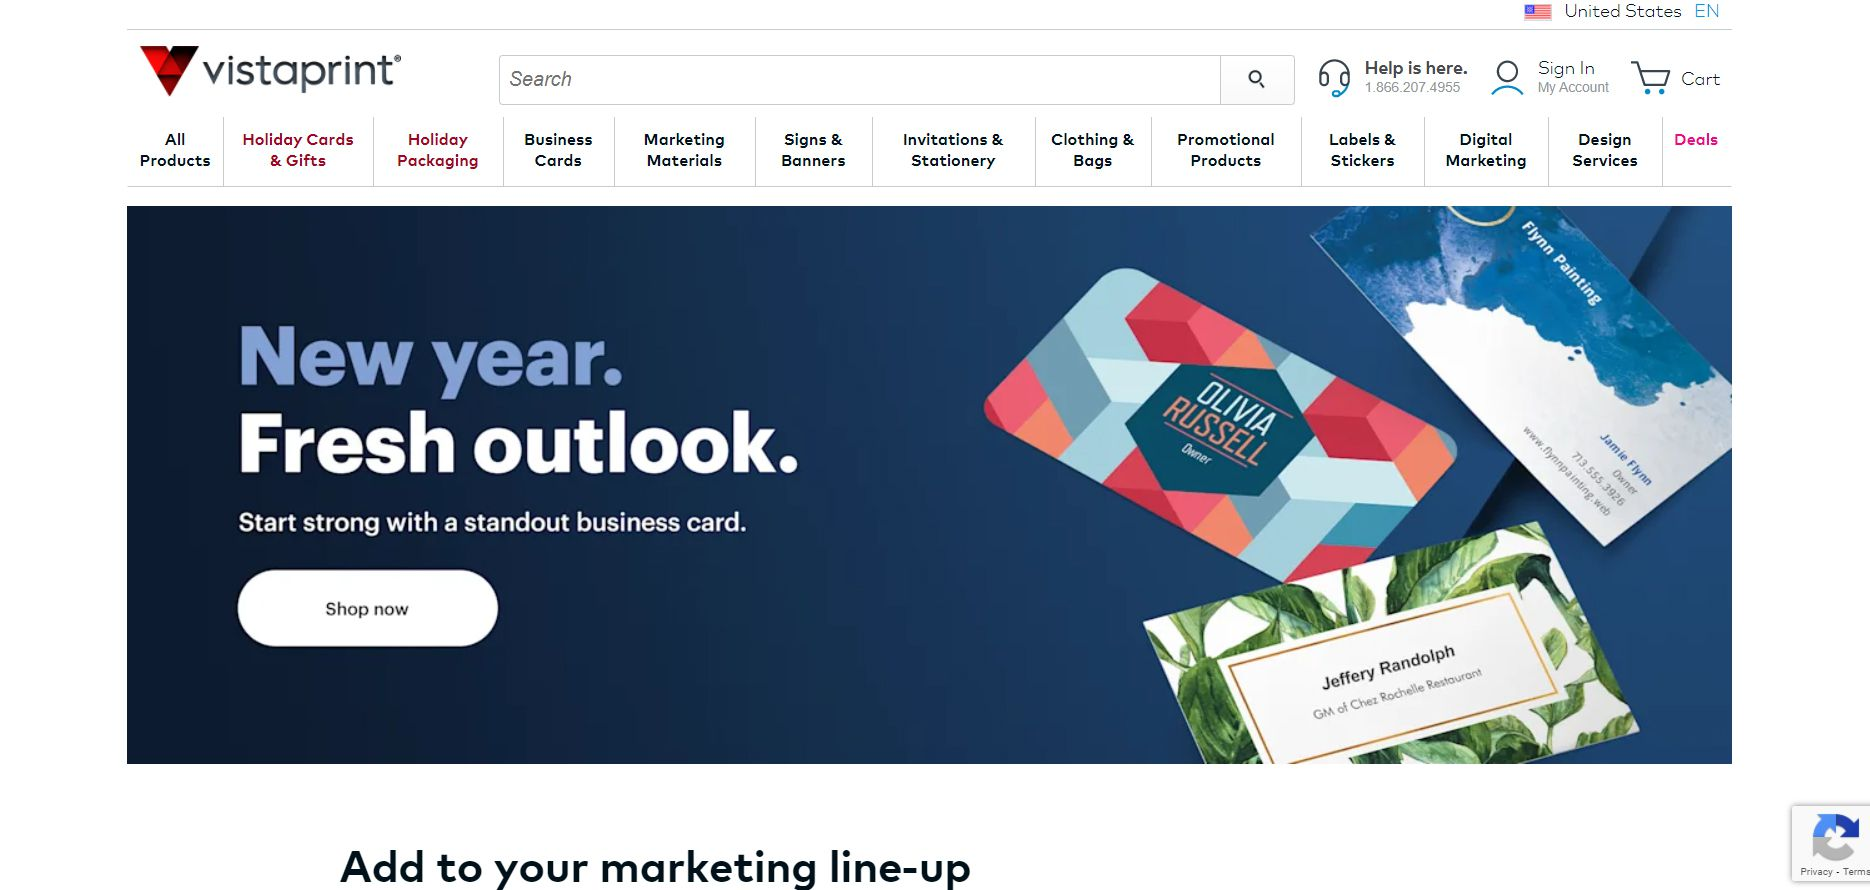 The VistaPrint homepage